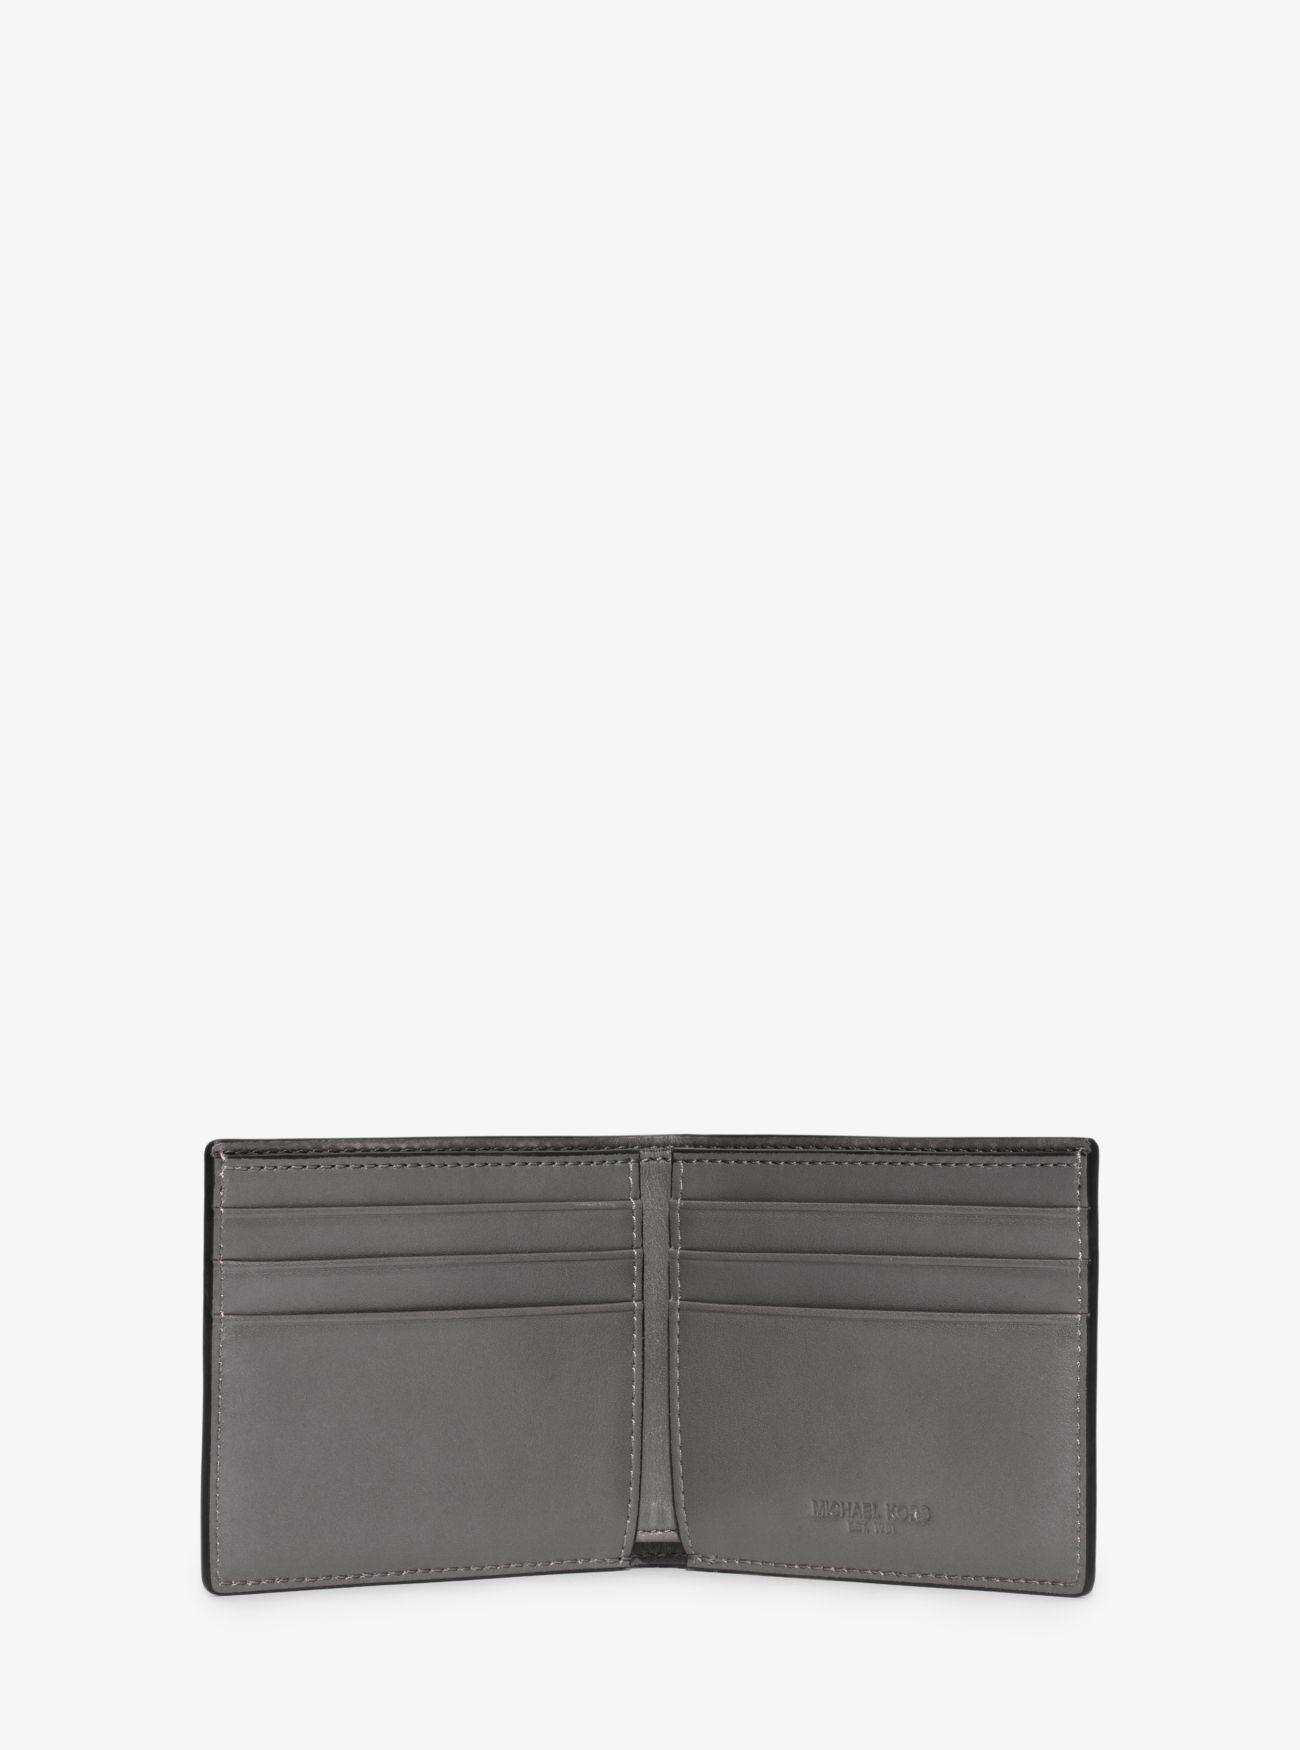 fdedfc2f987c Michael Kors - Blue Harrison Leather Slim Billfold Wallet for Men - Lyst.  View fullscreen